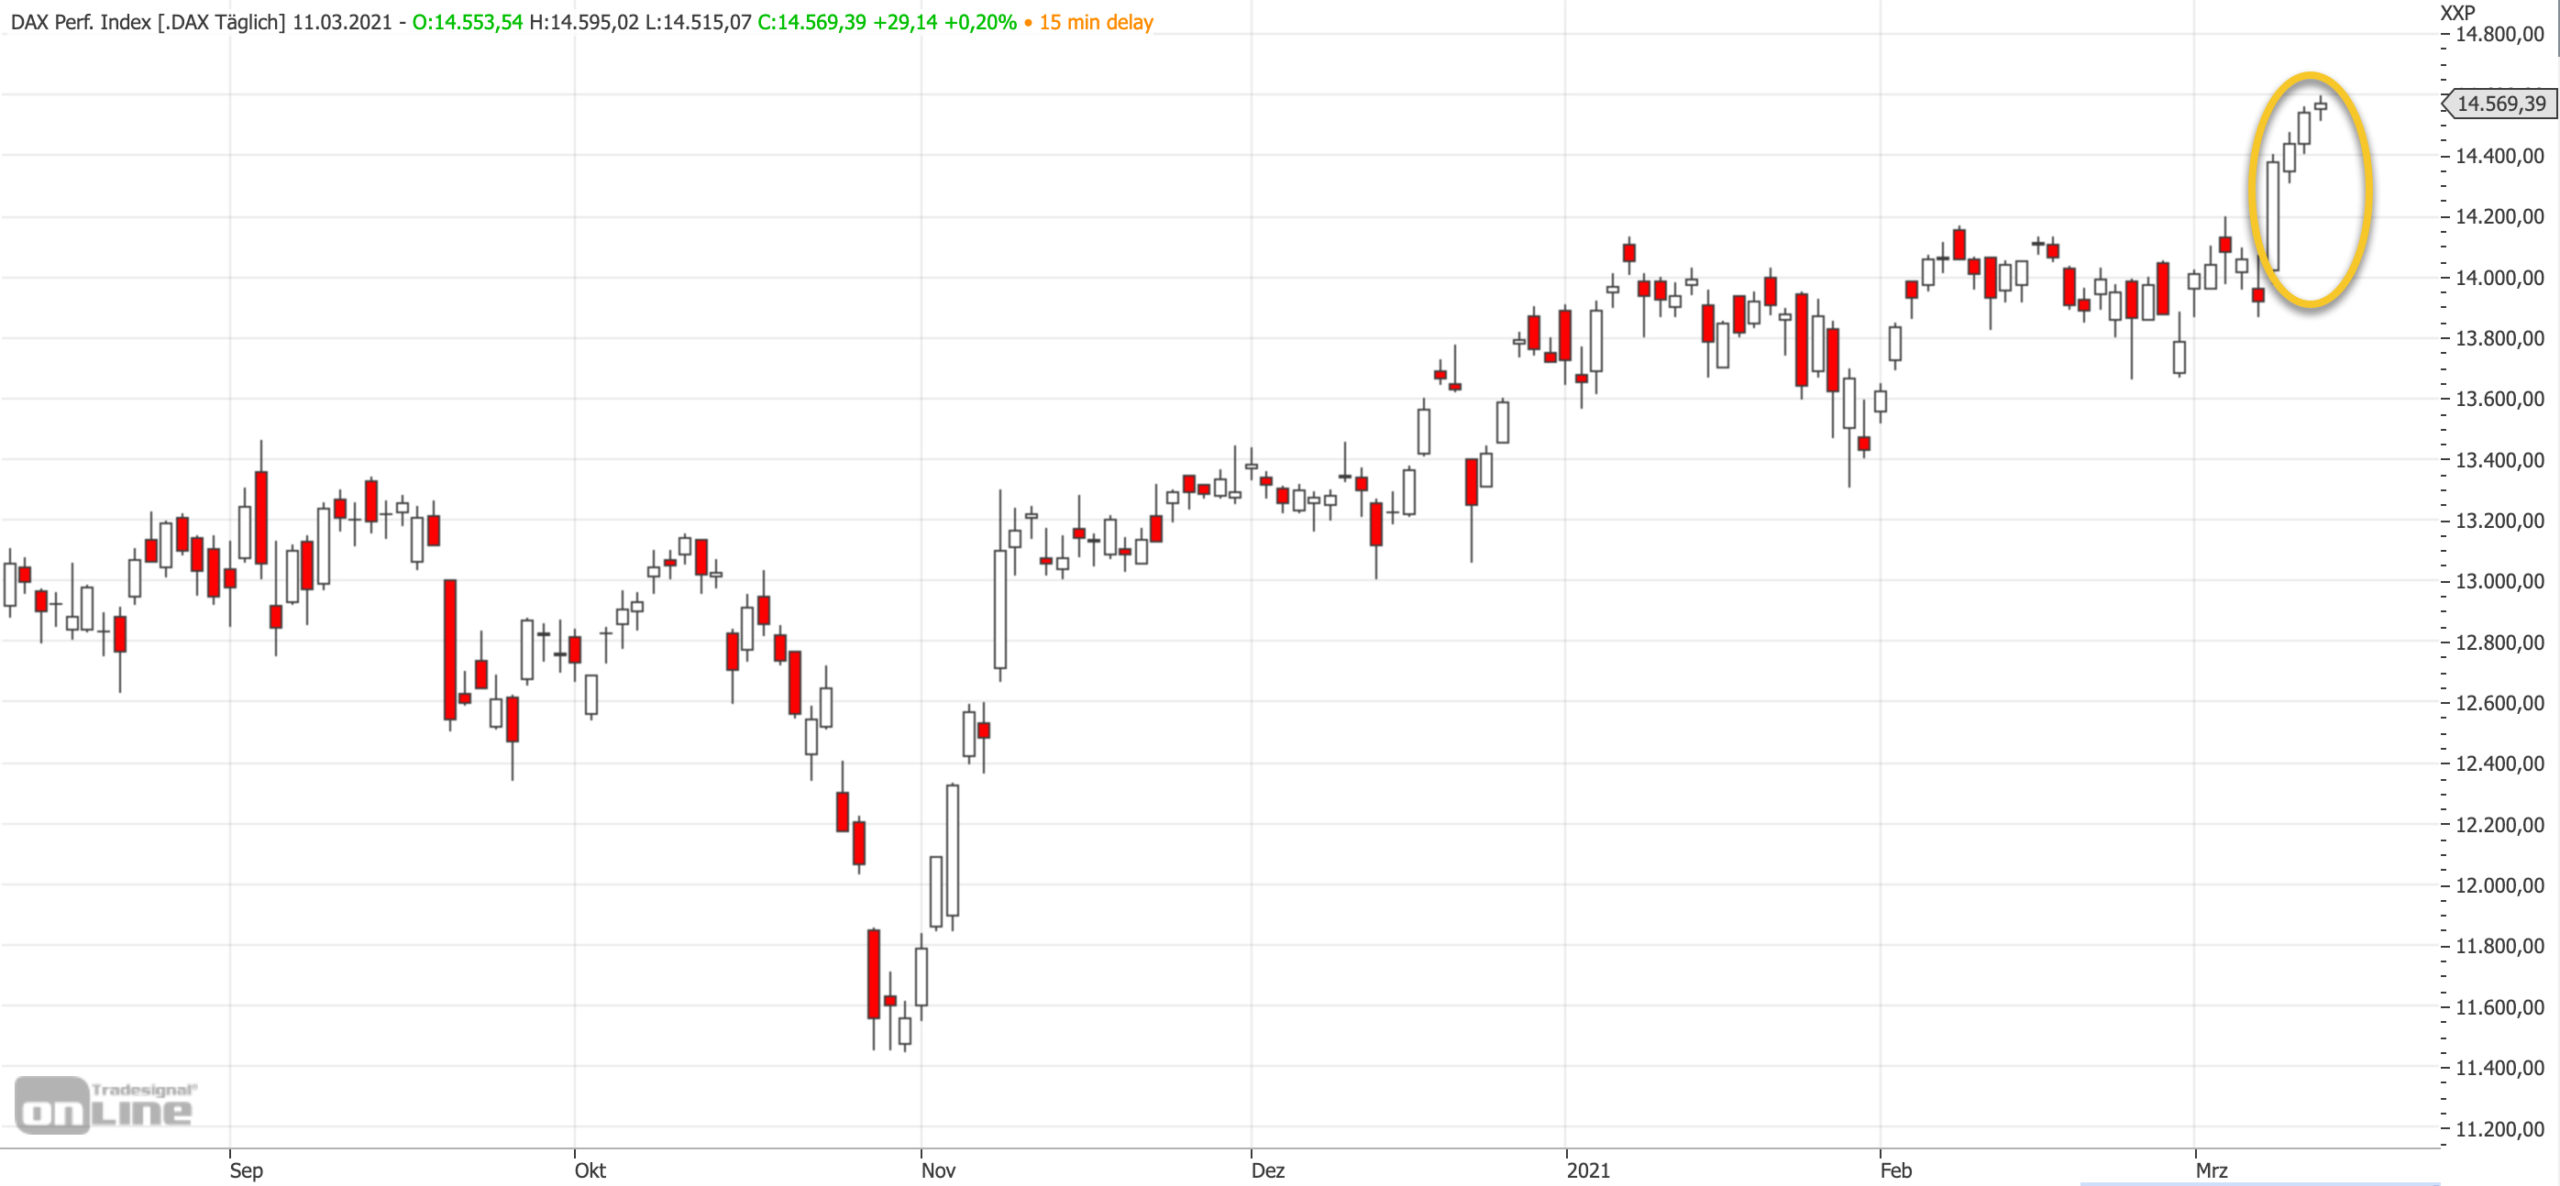 Mittelfristiger DAX-Blick nach dem EZB-Tag